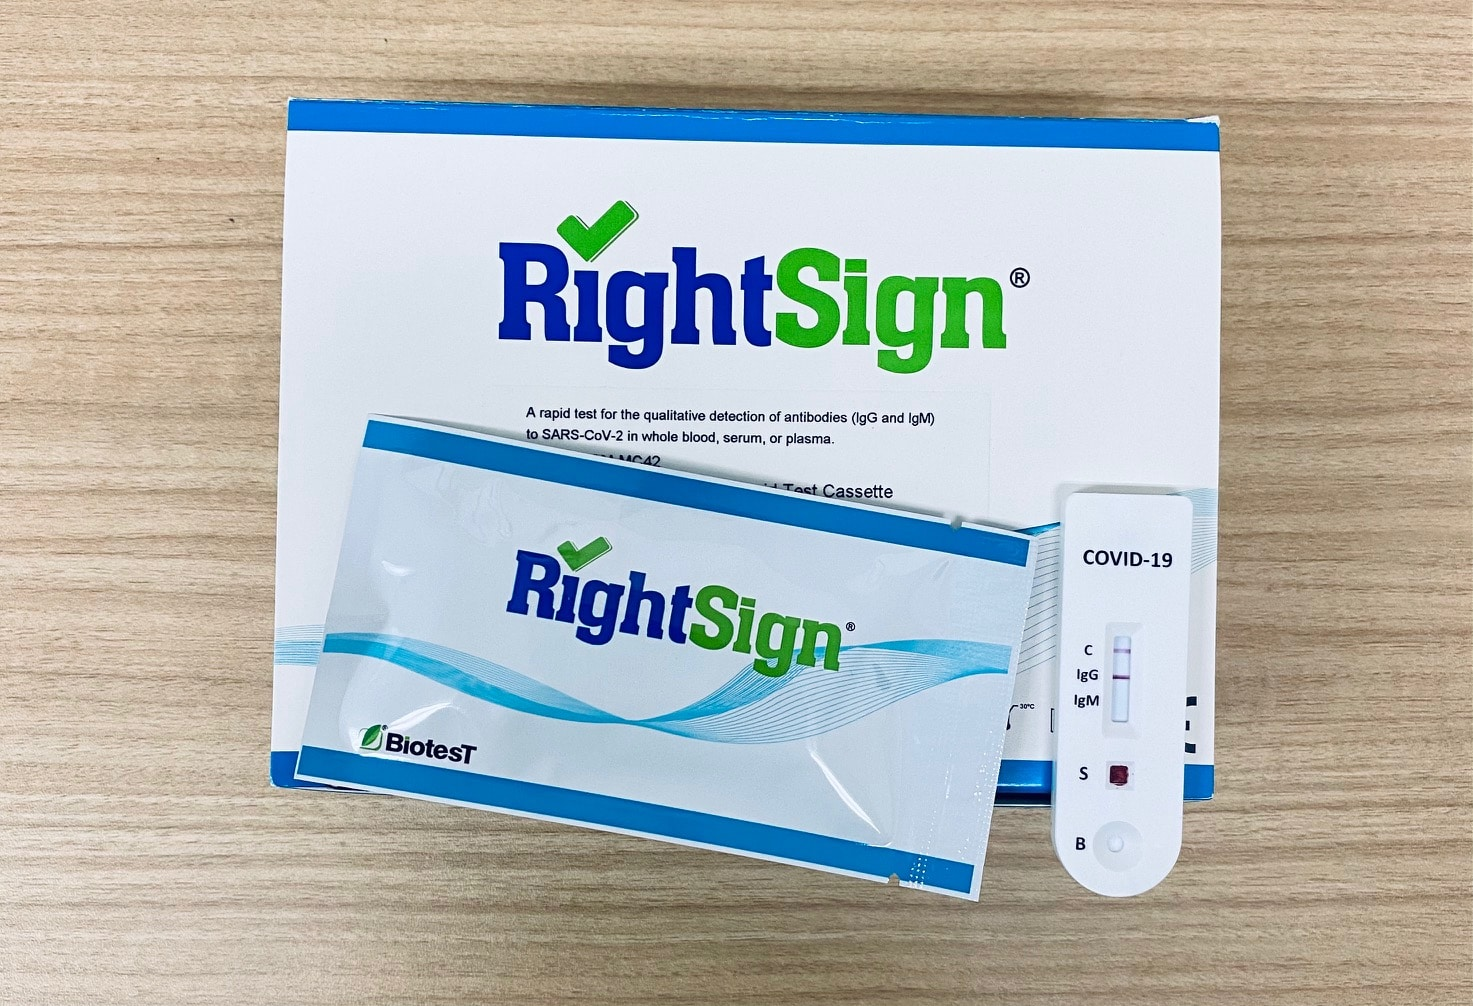 RightSign COVID-19 IgG/IgM Rapid Test Cassette